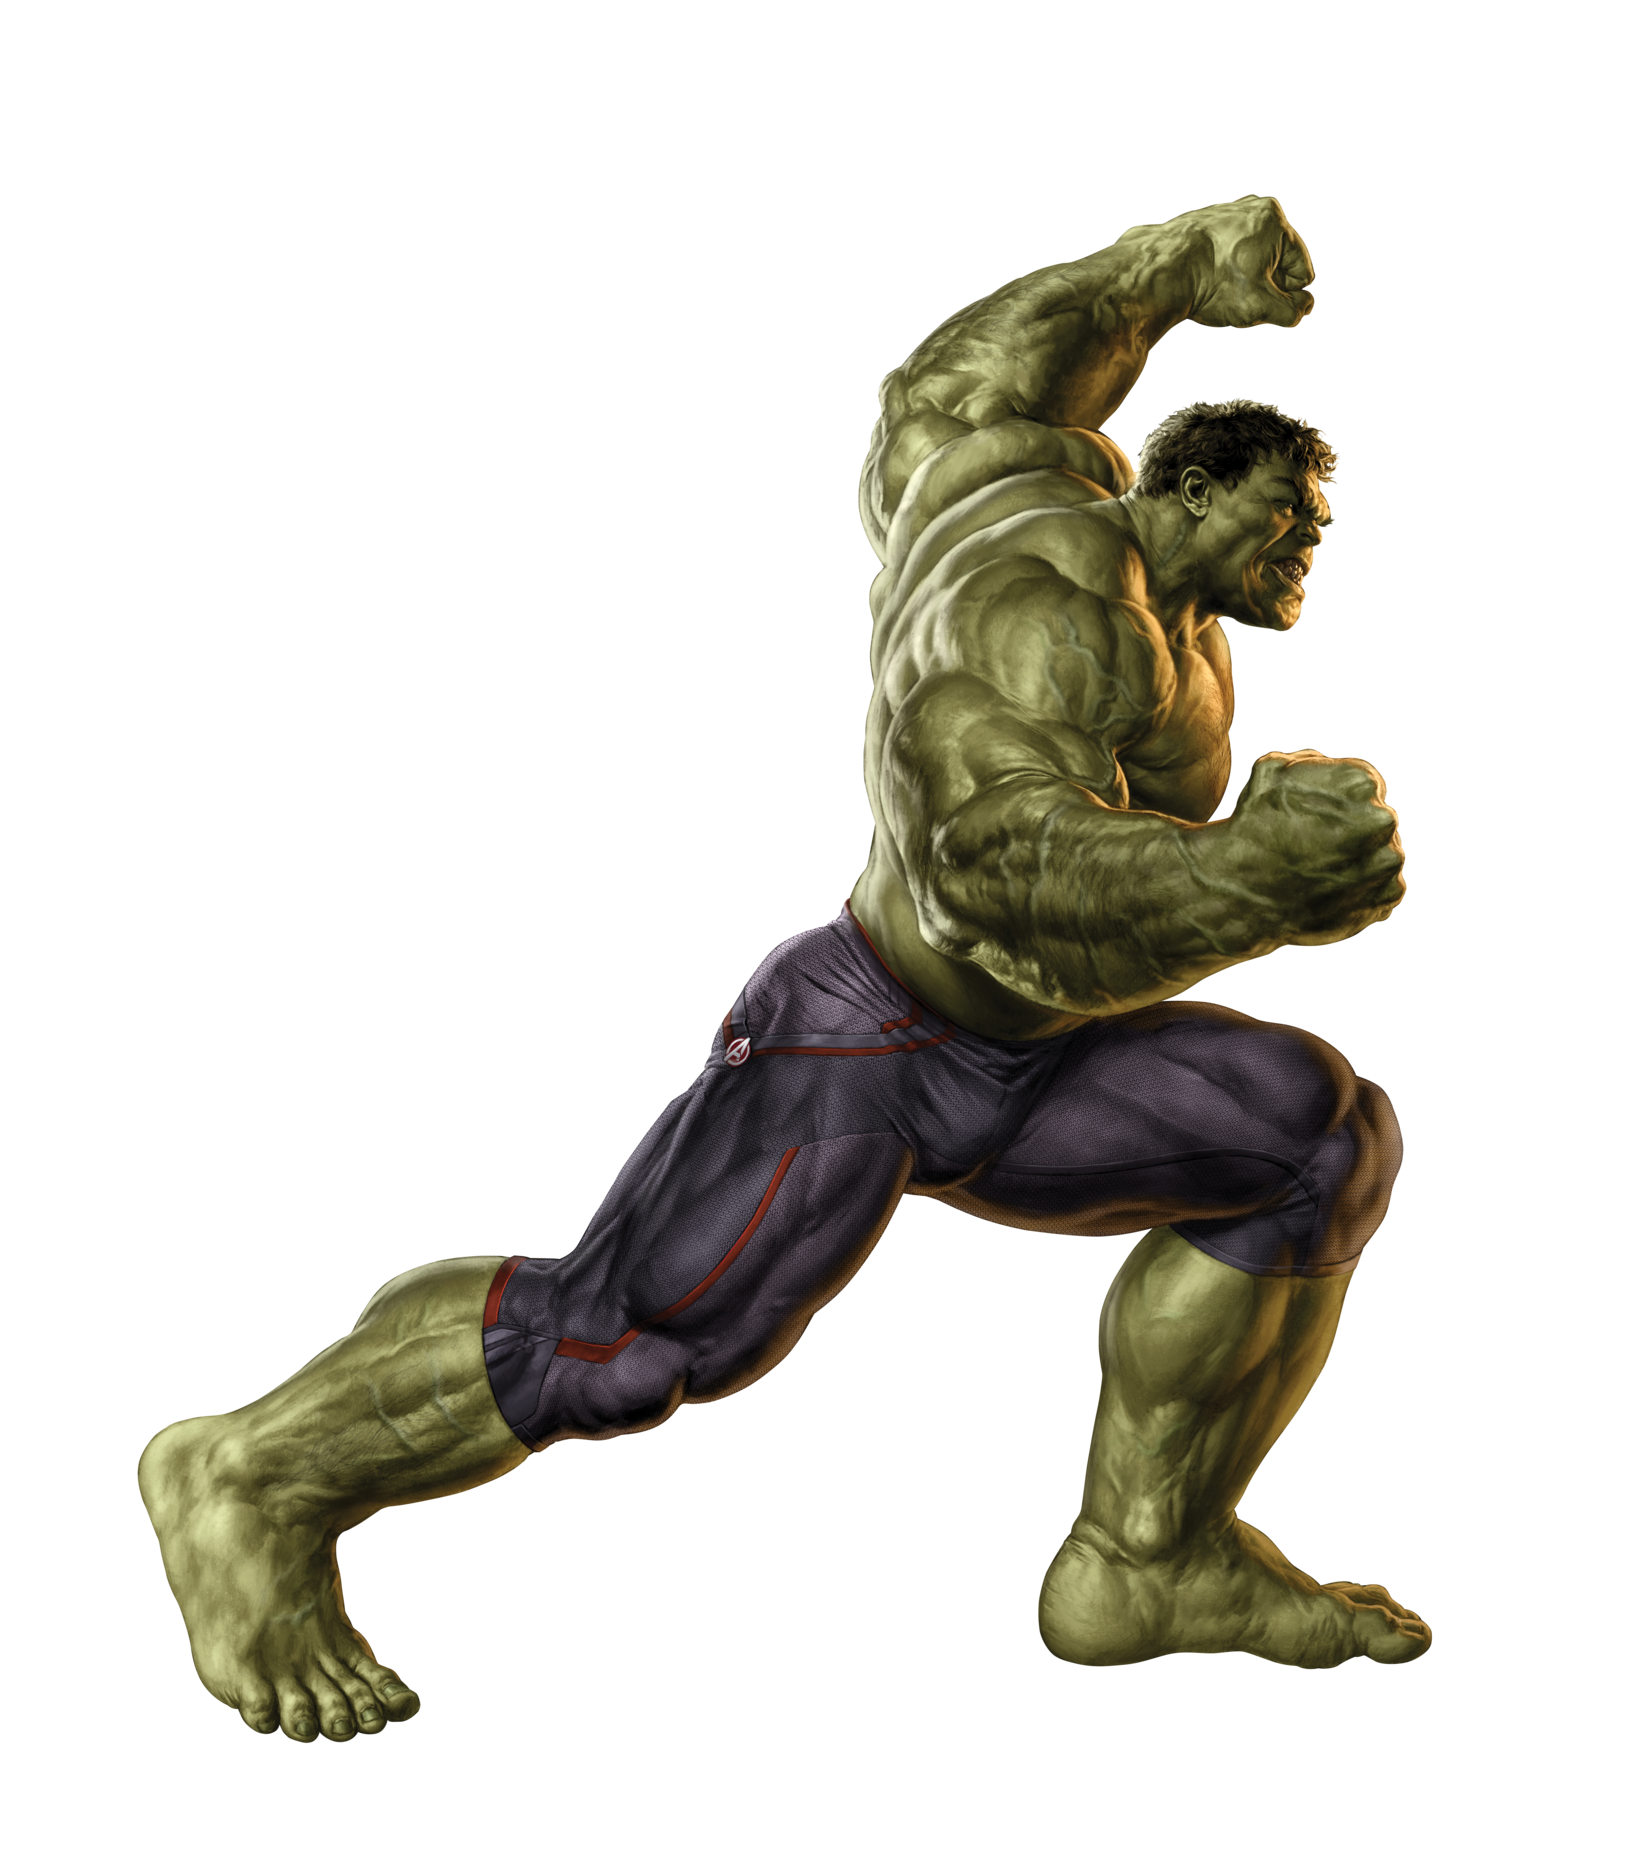 Hulk clipart drawing. Clip art the st